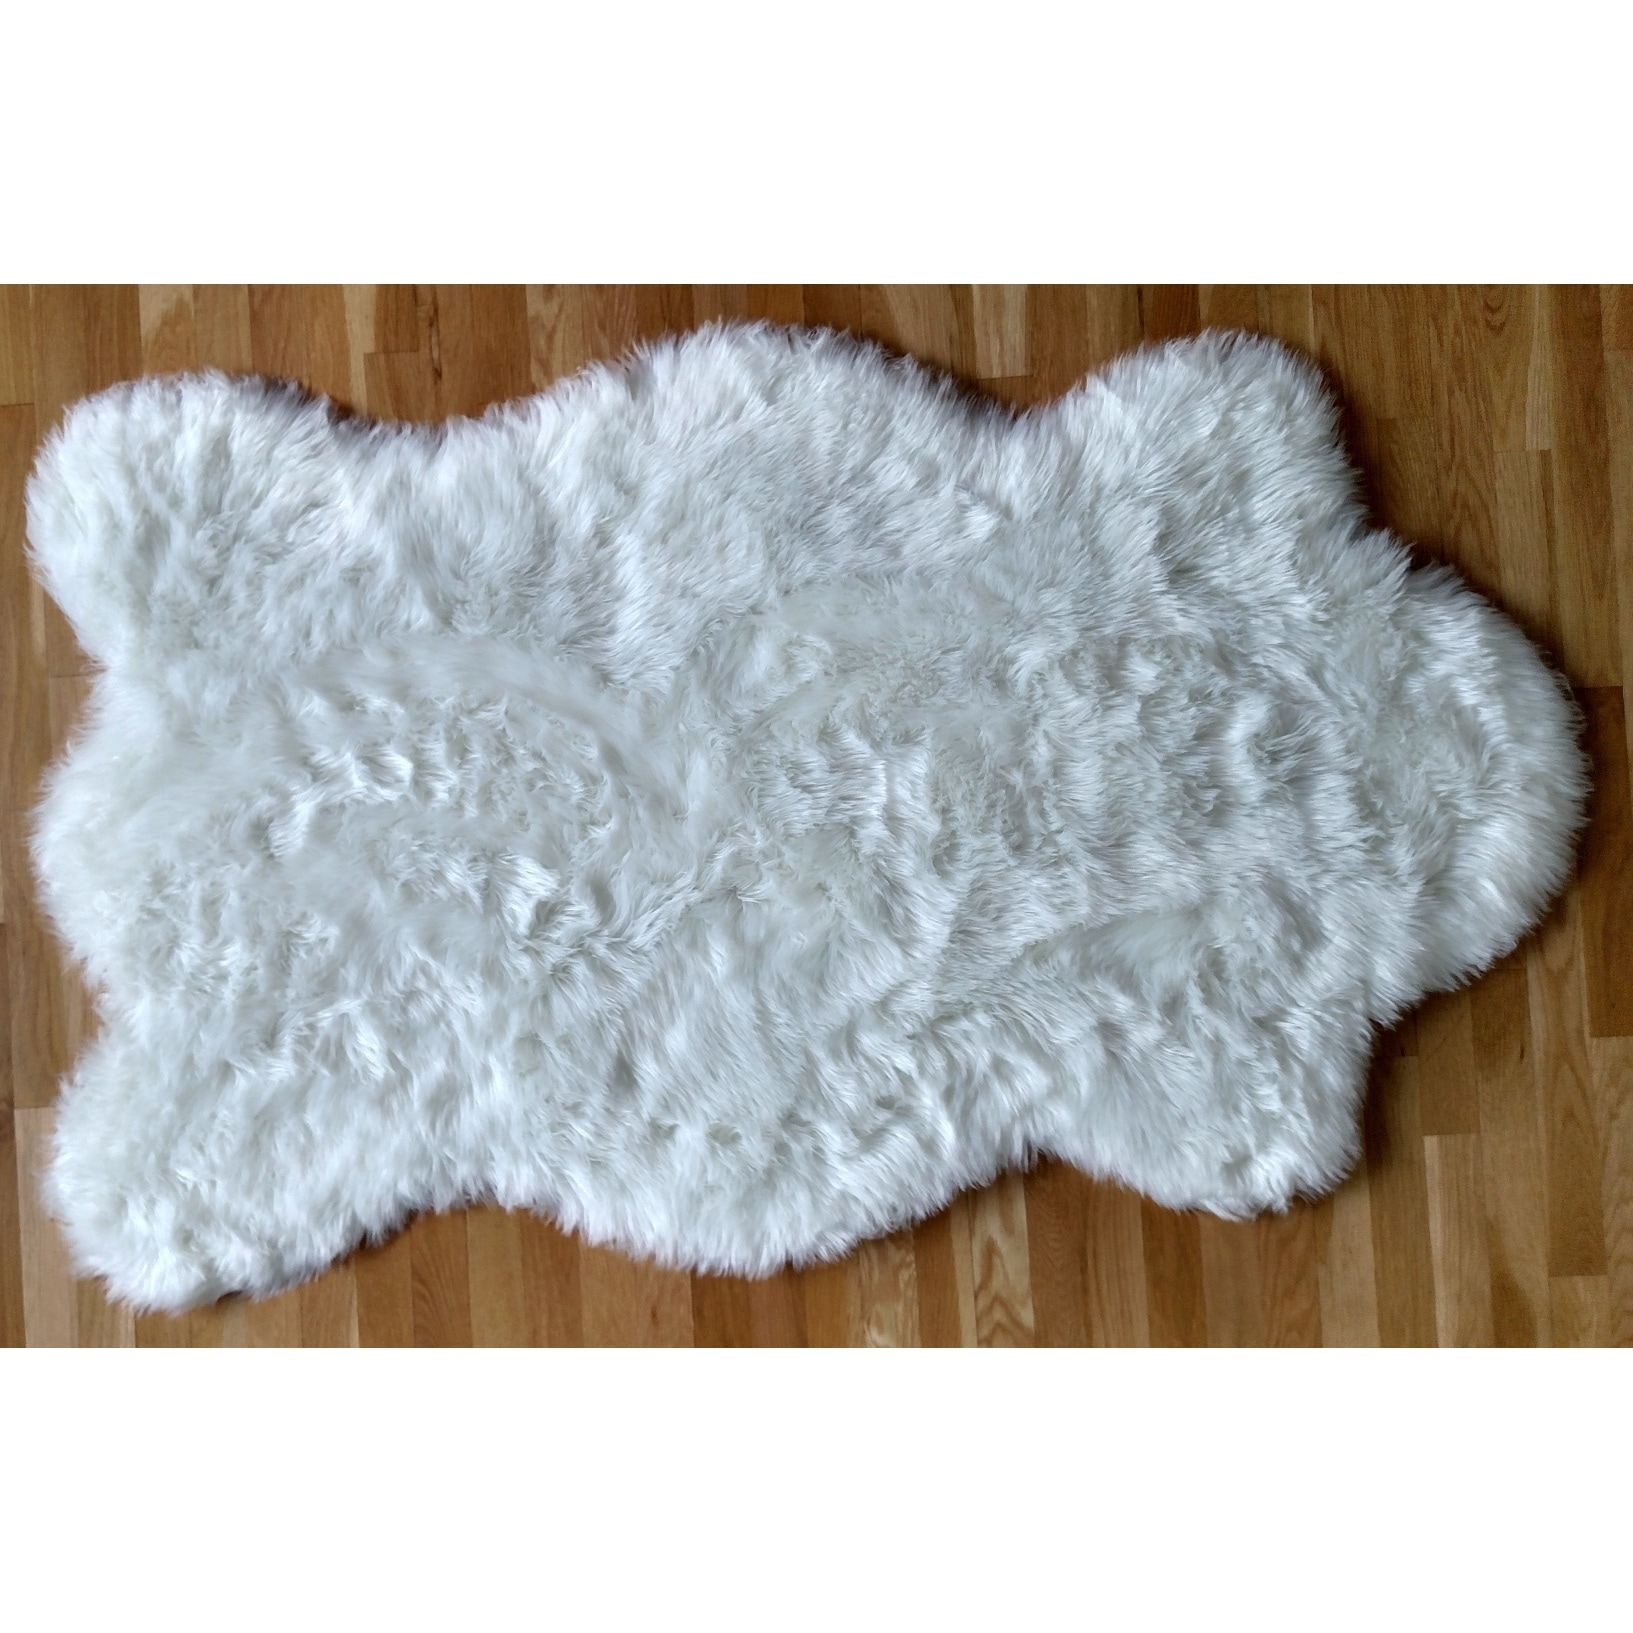 free form rug  Faux Fur Sheepskin Shag Area Rug White Pelt Free Form - 8